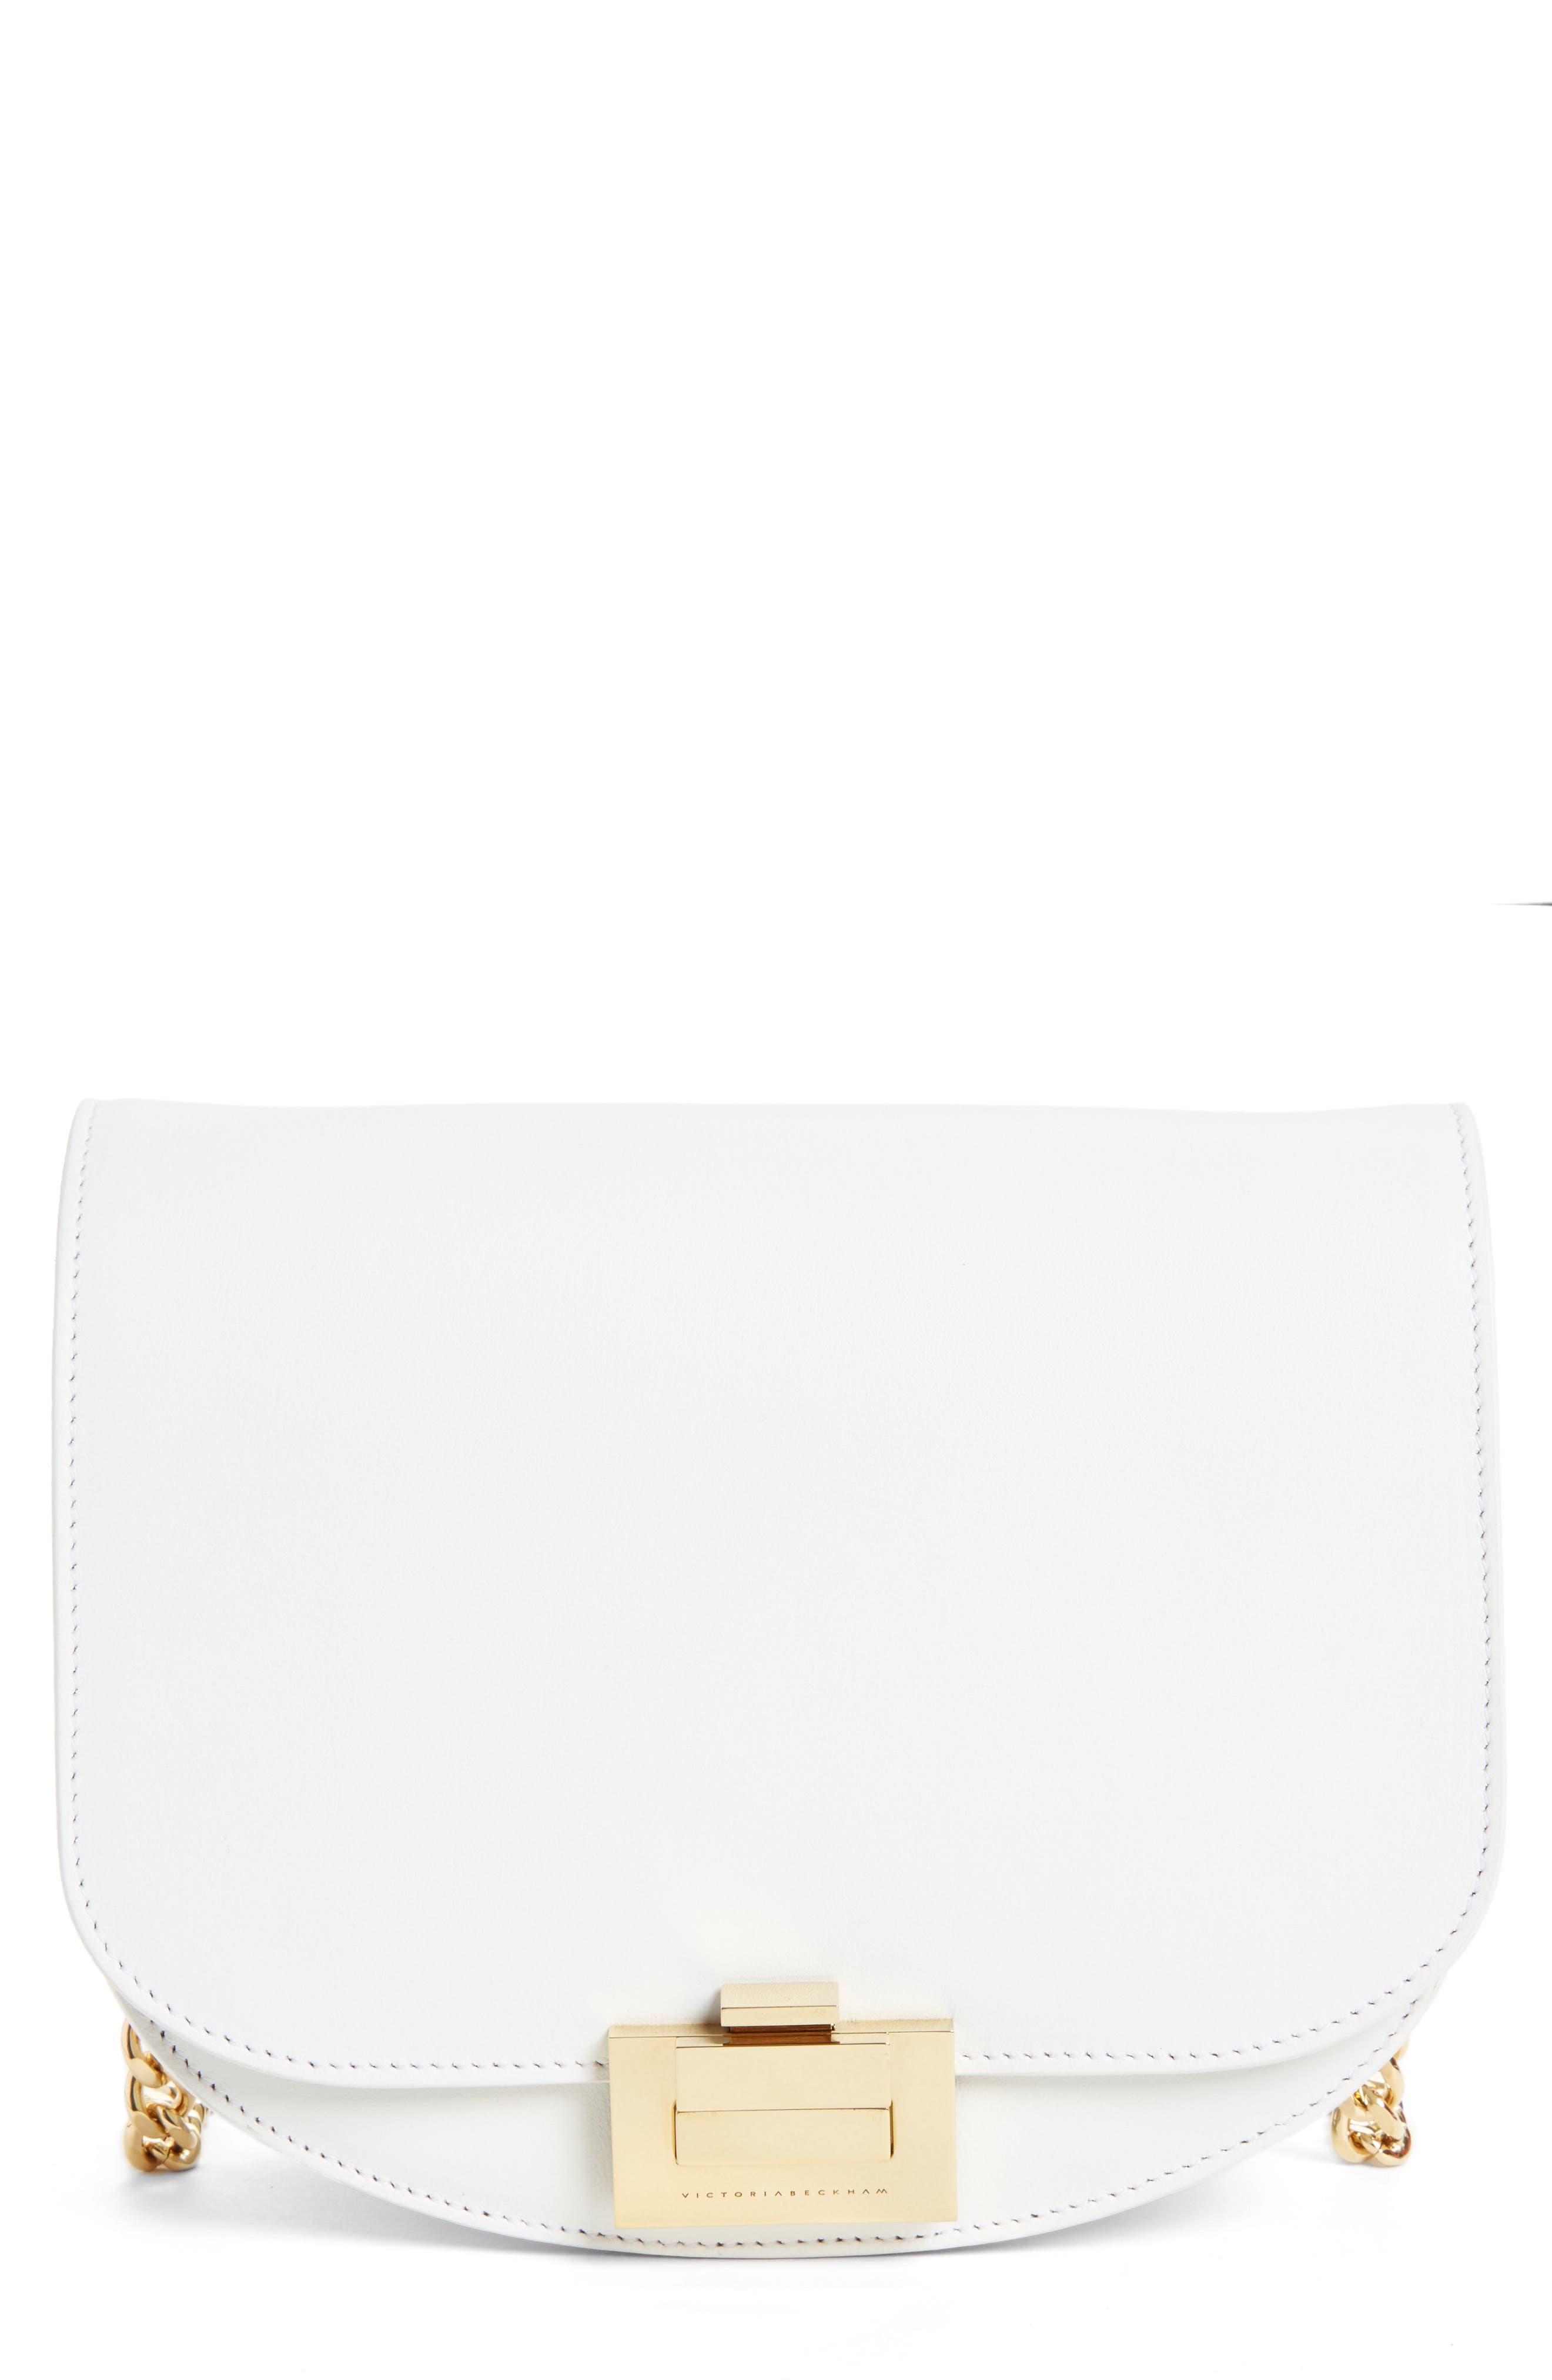 Main Image - Victoria Beckham Leather Bag